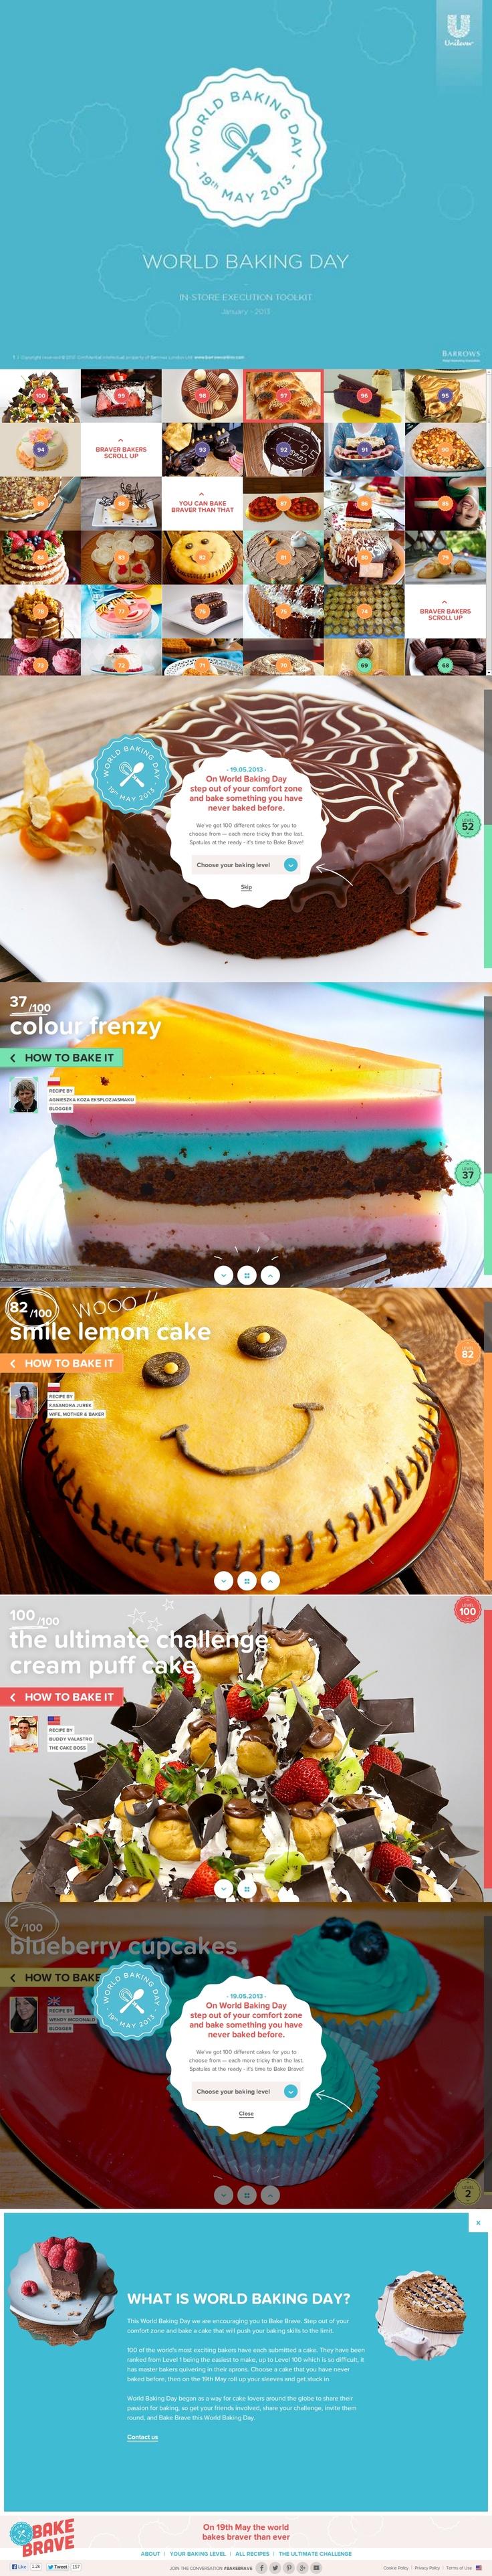 Bake Brave - World Baking Day http://www.awwwards.com/web-design-awards/bake-brave-world-baking-day #webdesign #inspiration #UI #Clean #ResponsiveDesign #CSS3 #Animation #HTML5 #Design #Red #Blue